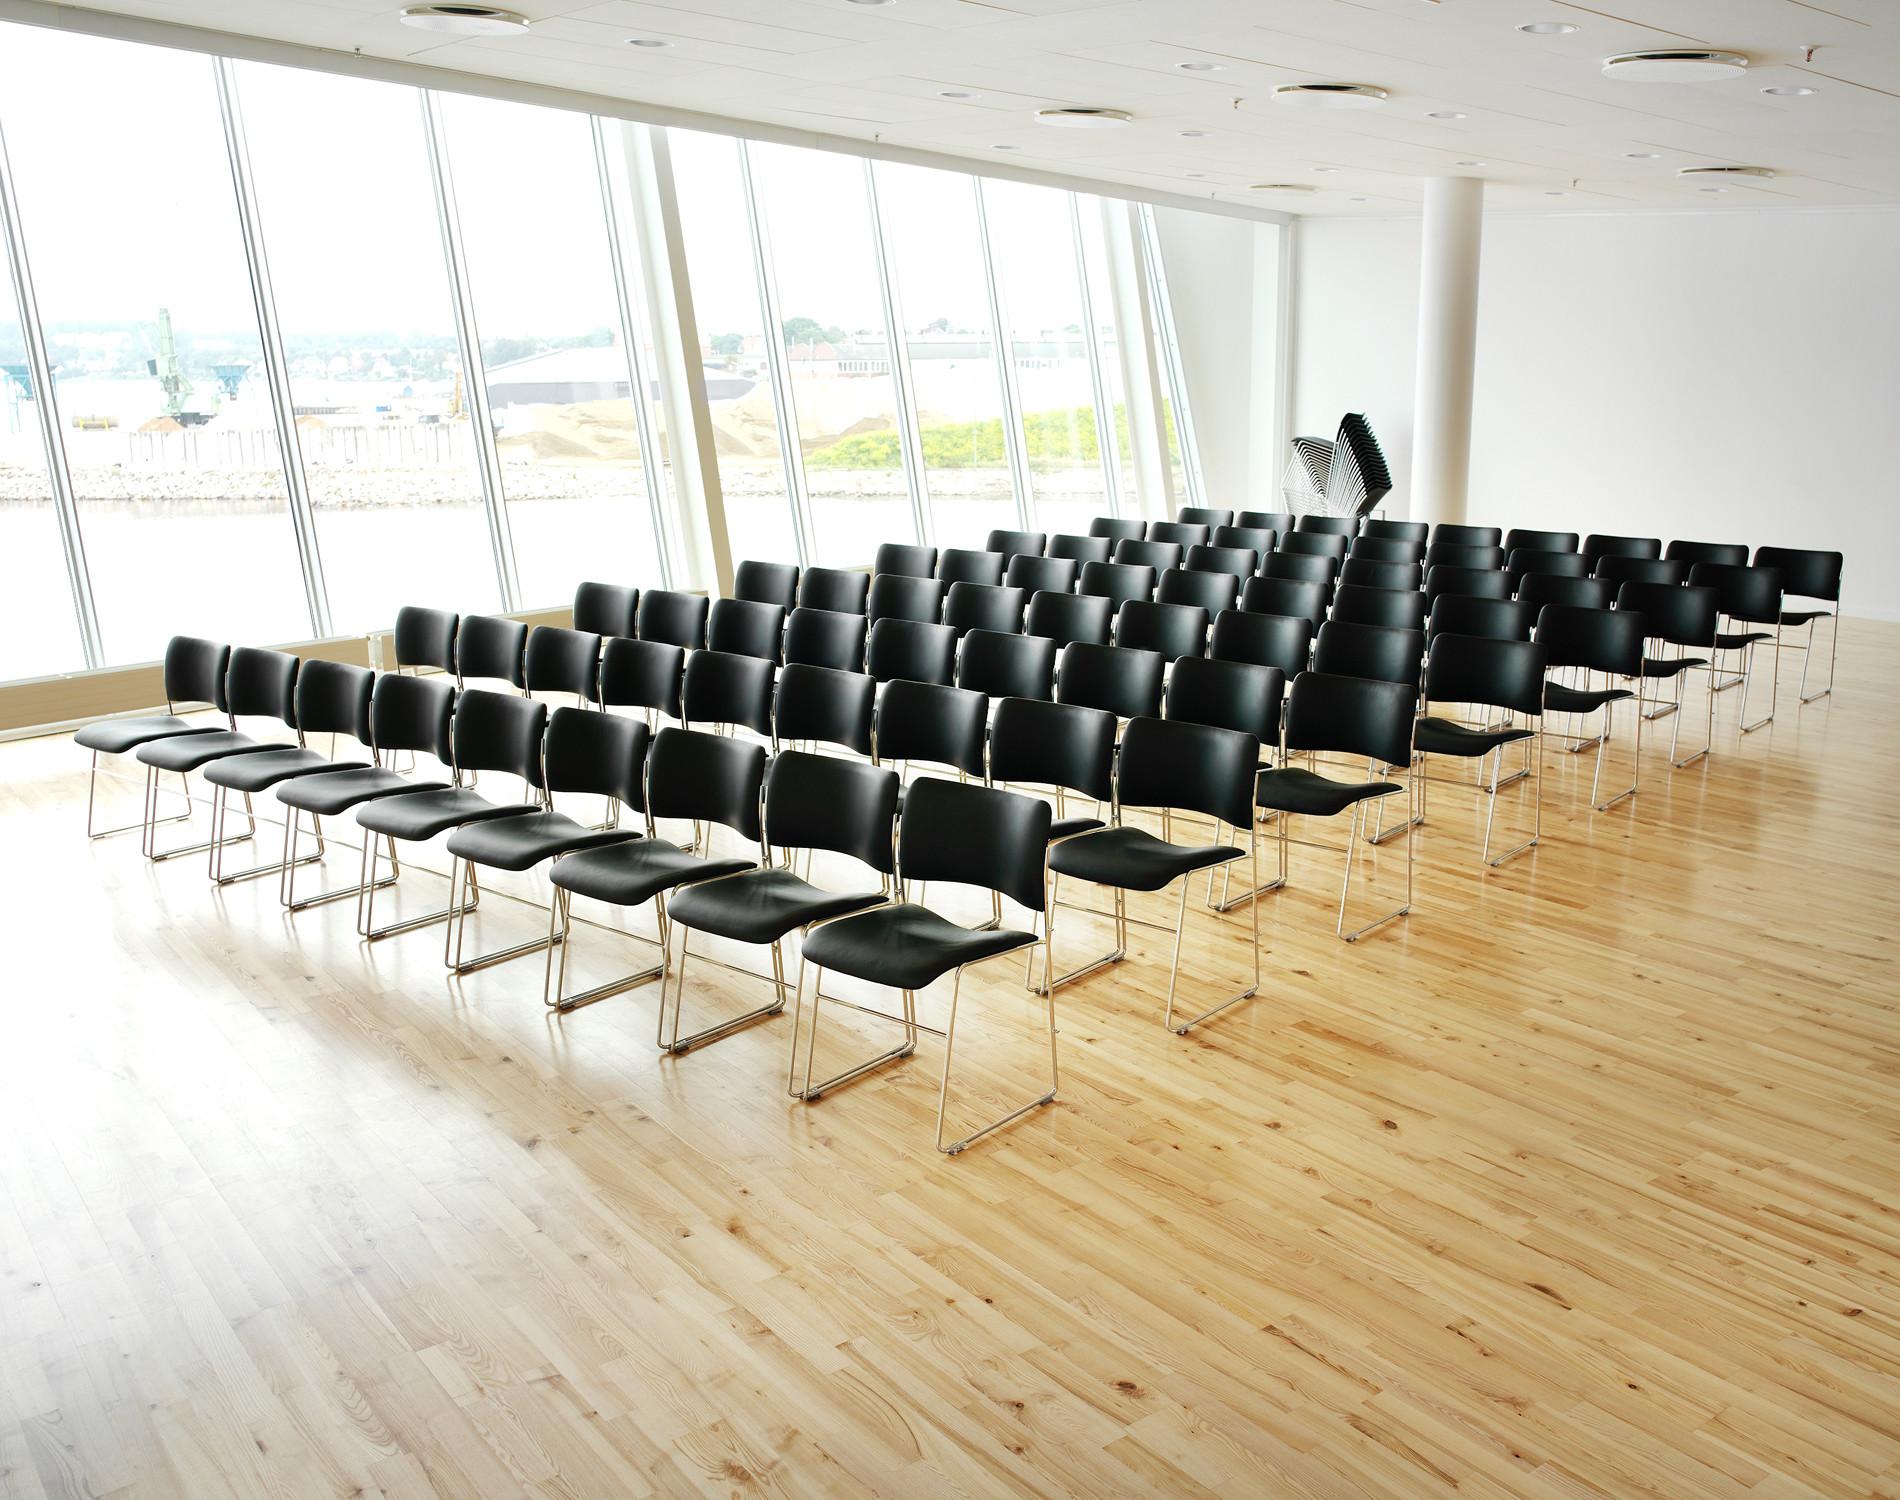 40/4 Meeting Room Chairs